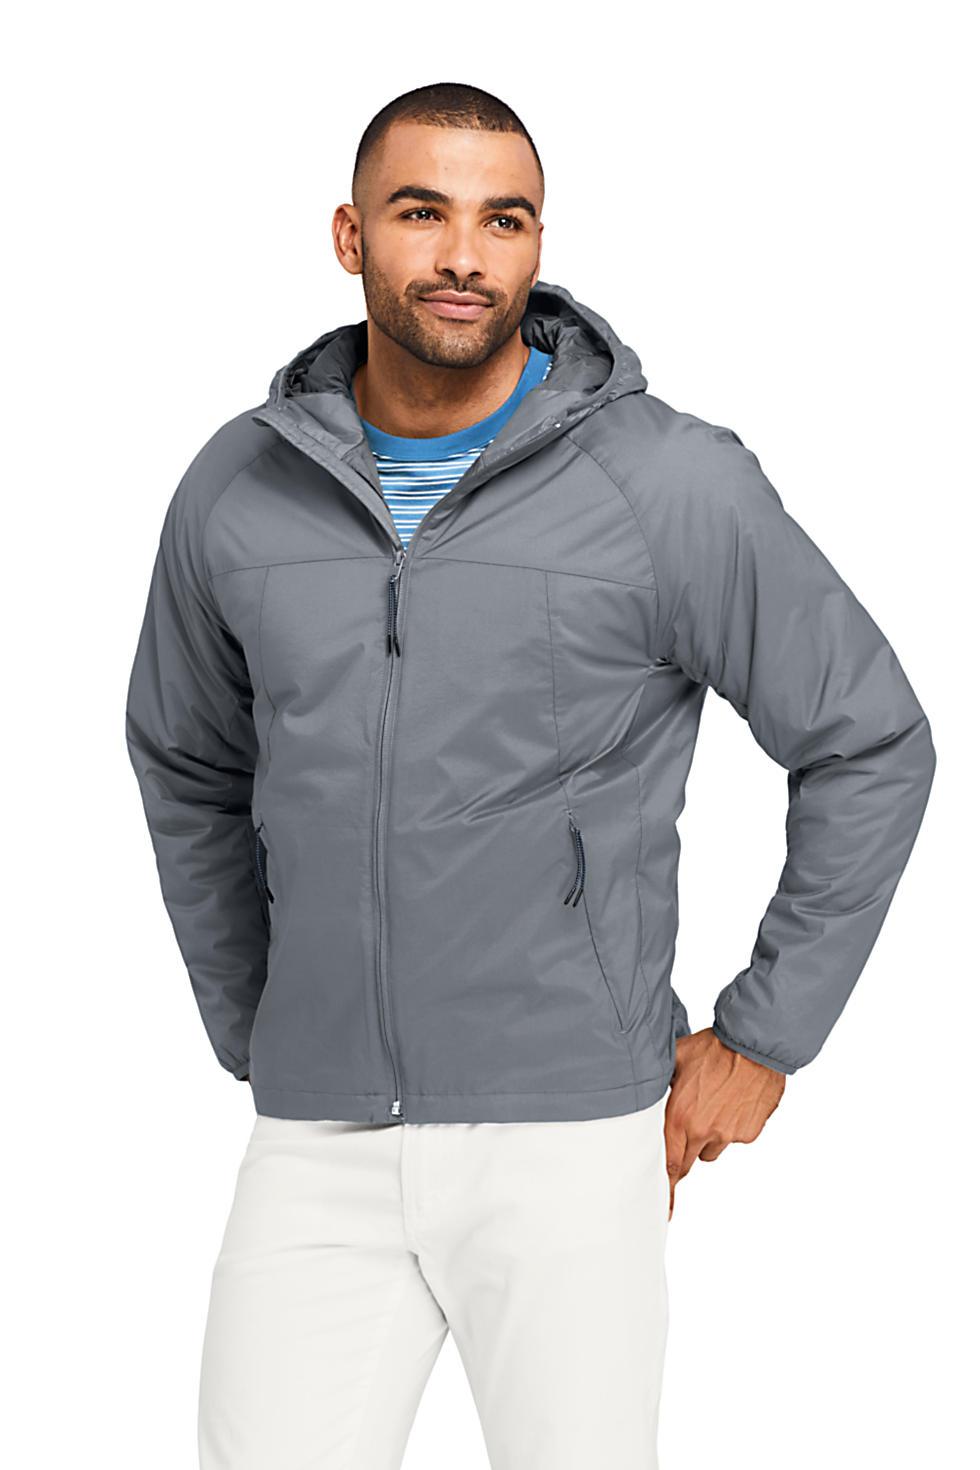 Lands' End Men's Stretch Packable Primaloft Insulated Hooded Jacket